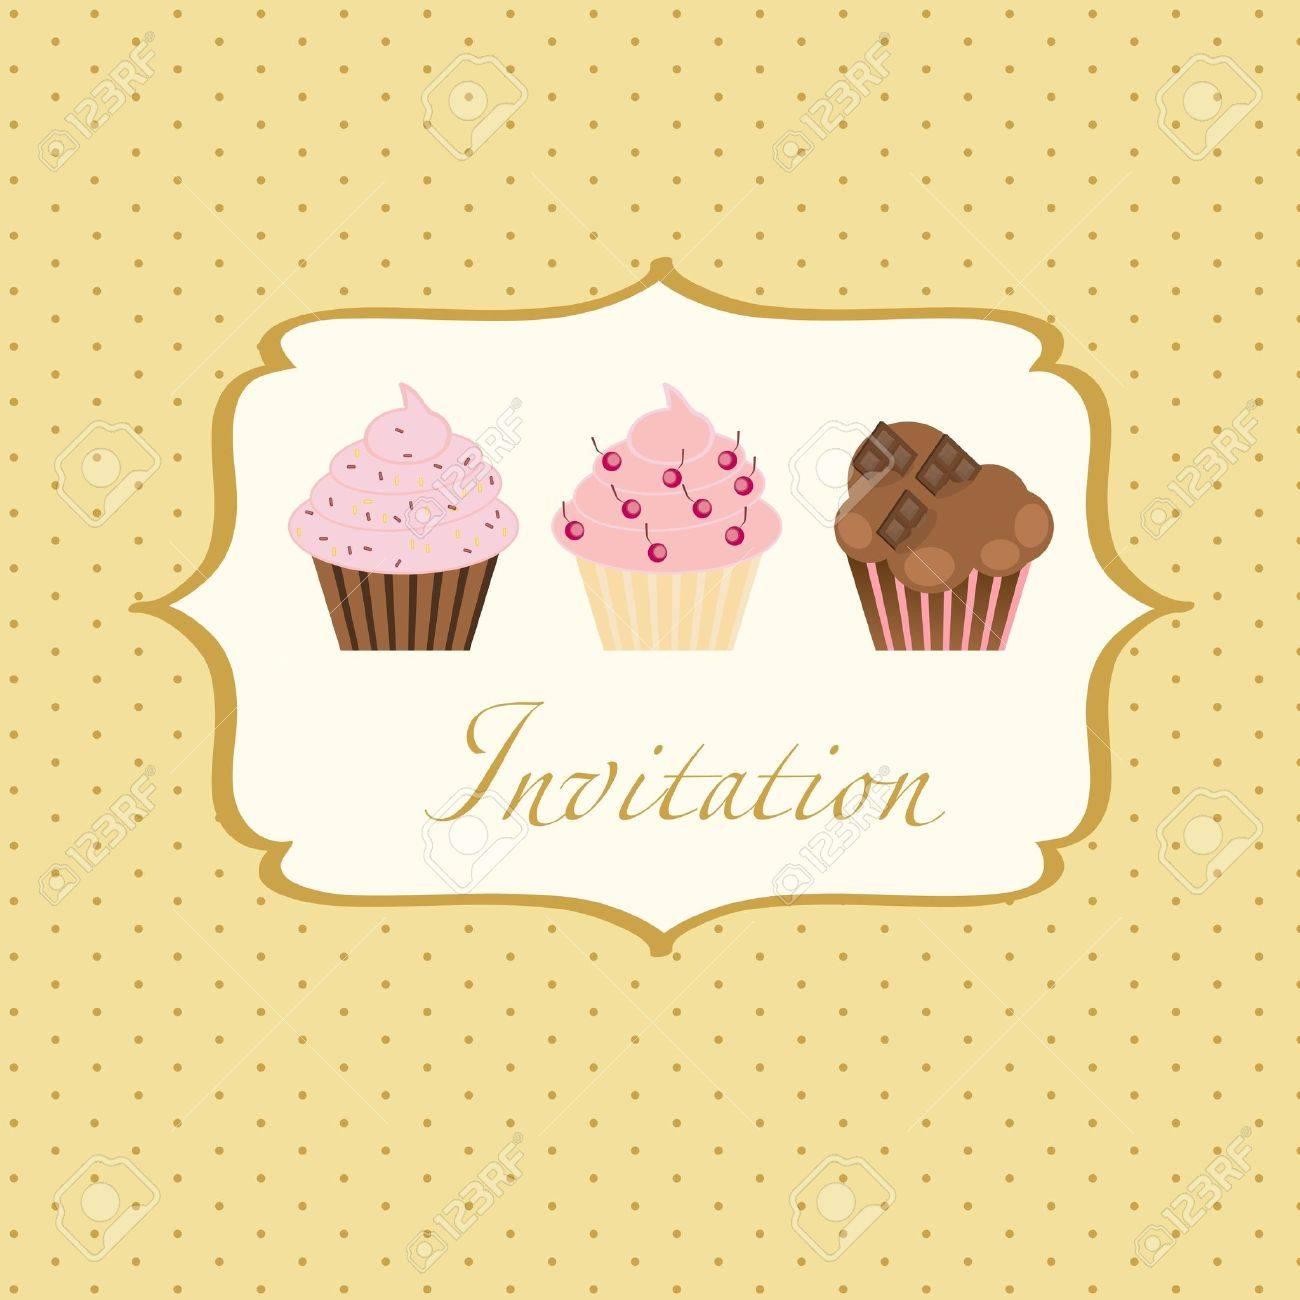 cupcake invitation background Stock Vector - 13101463